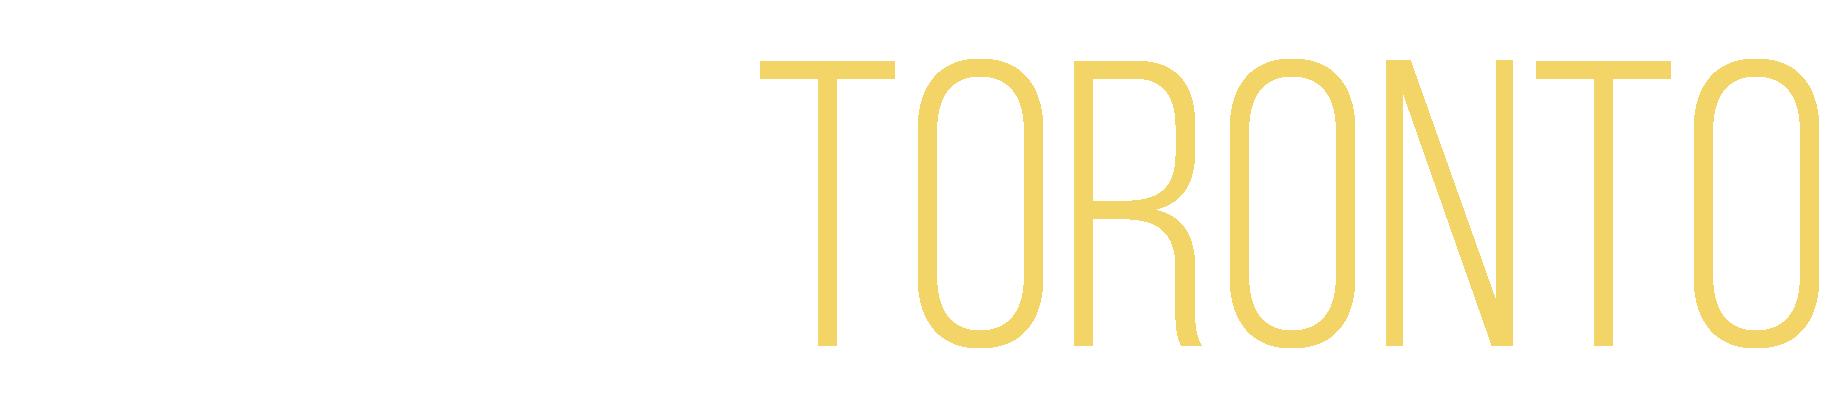 TasteToronto-New-Logo-White.png